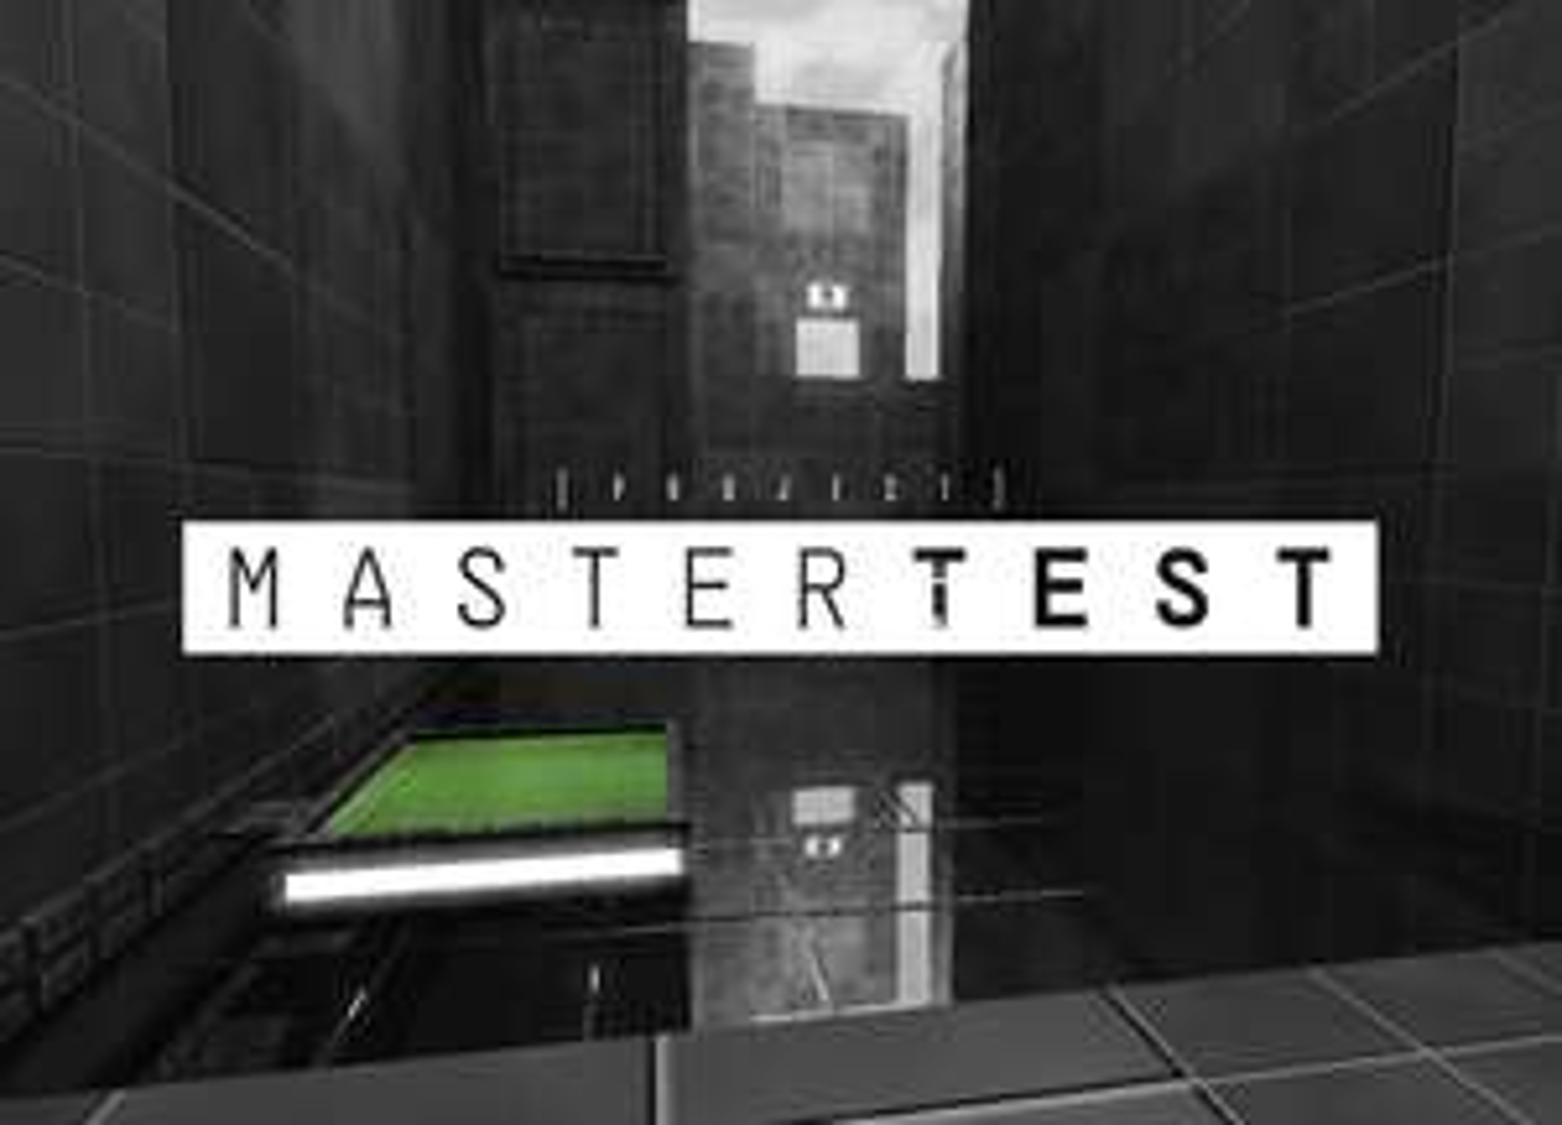 (PC) Mastertest (itch.io)